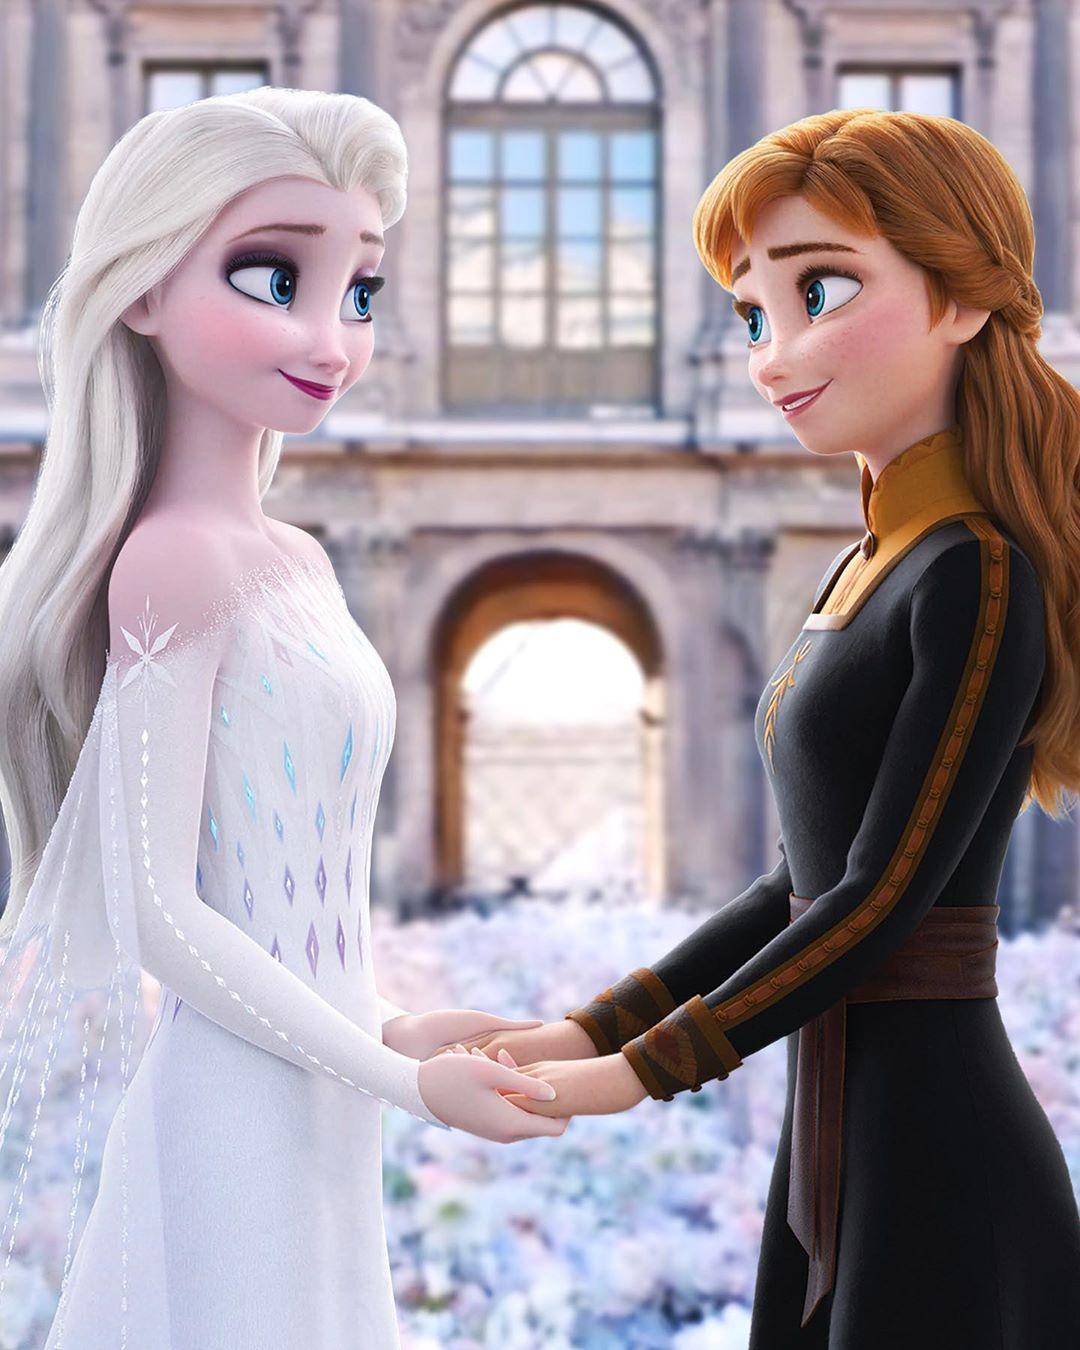 Anna And Elsa Constable Frozen On Instagram Frozen